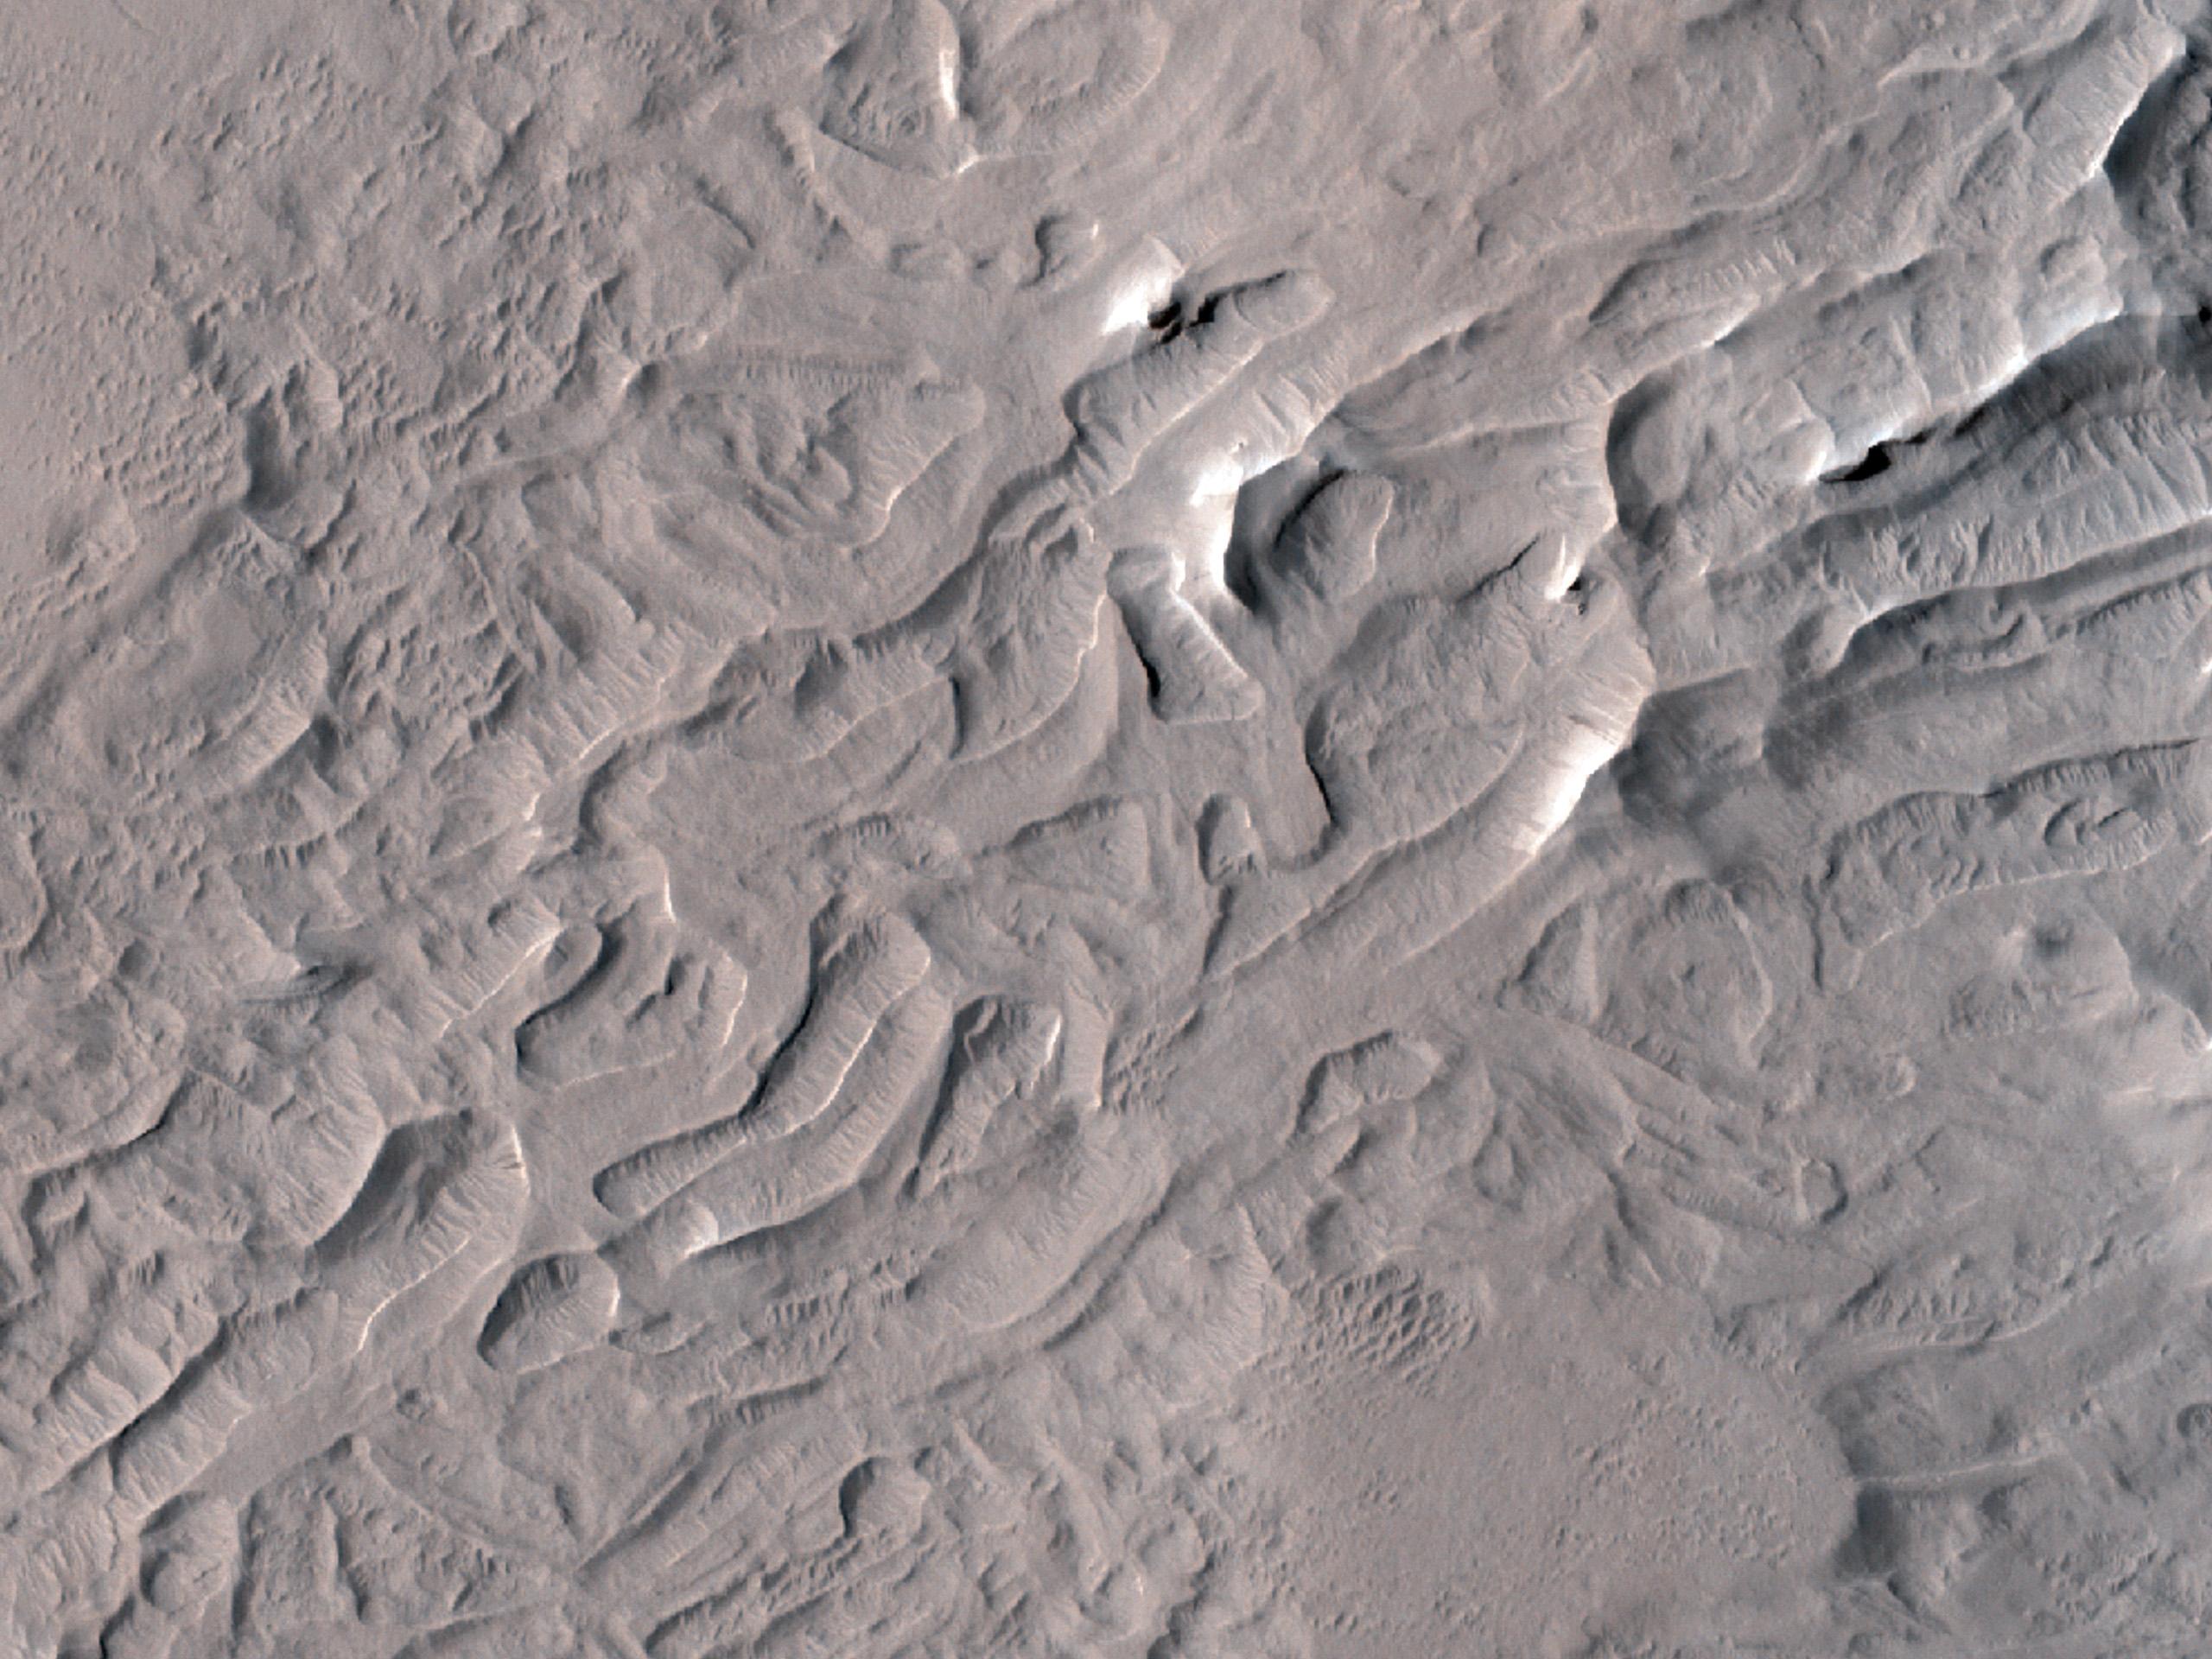 Ridges and Crescentic Forms in Arabia Terra